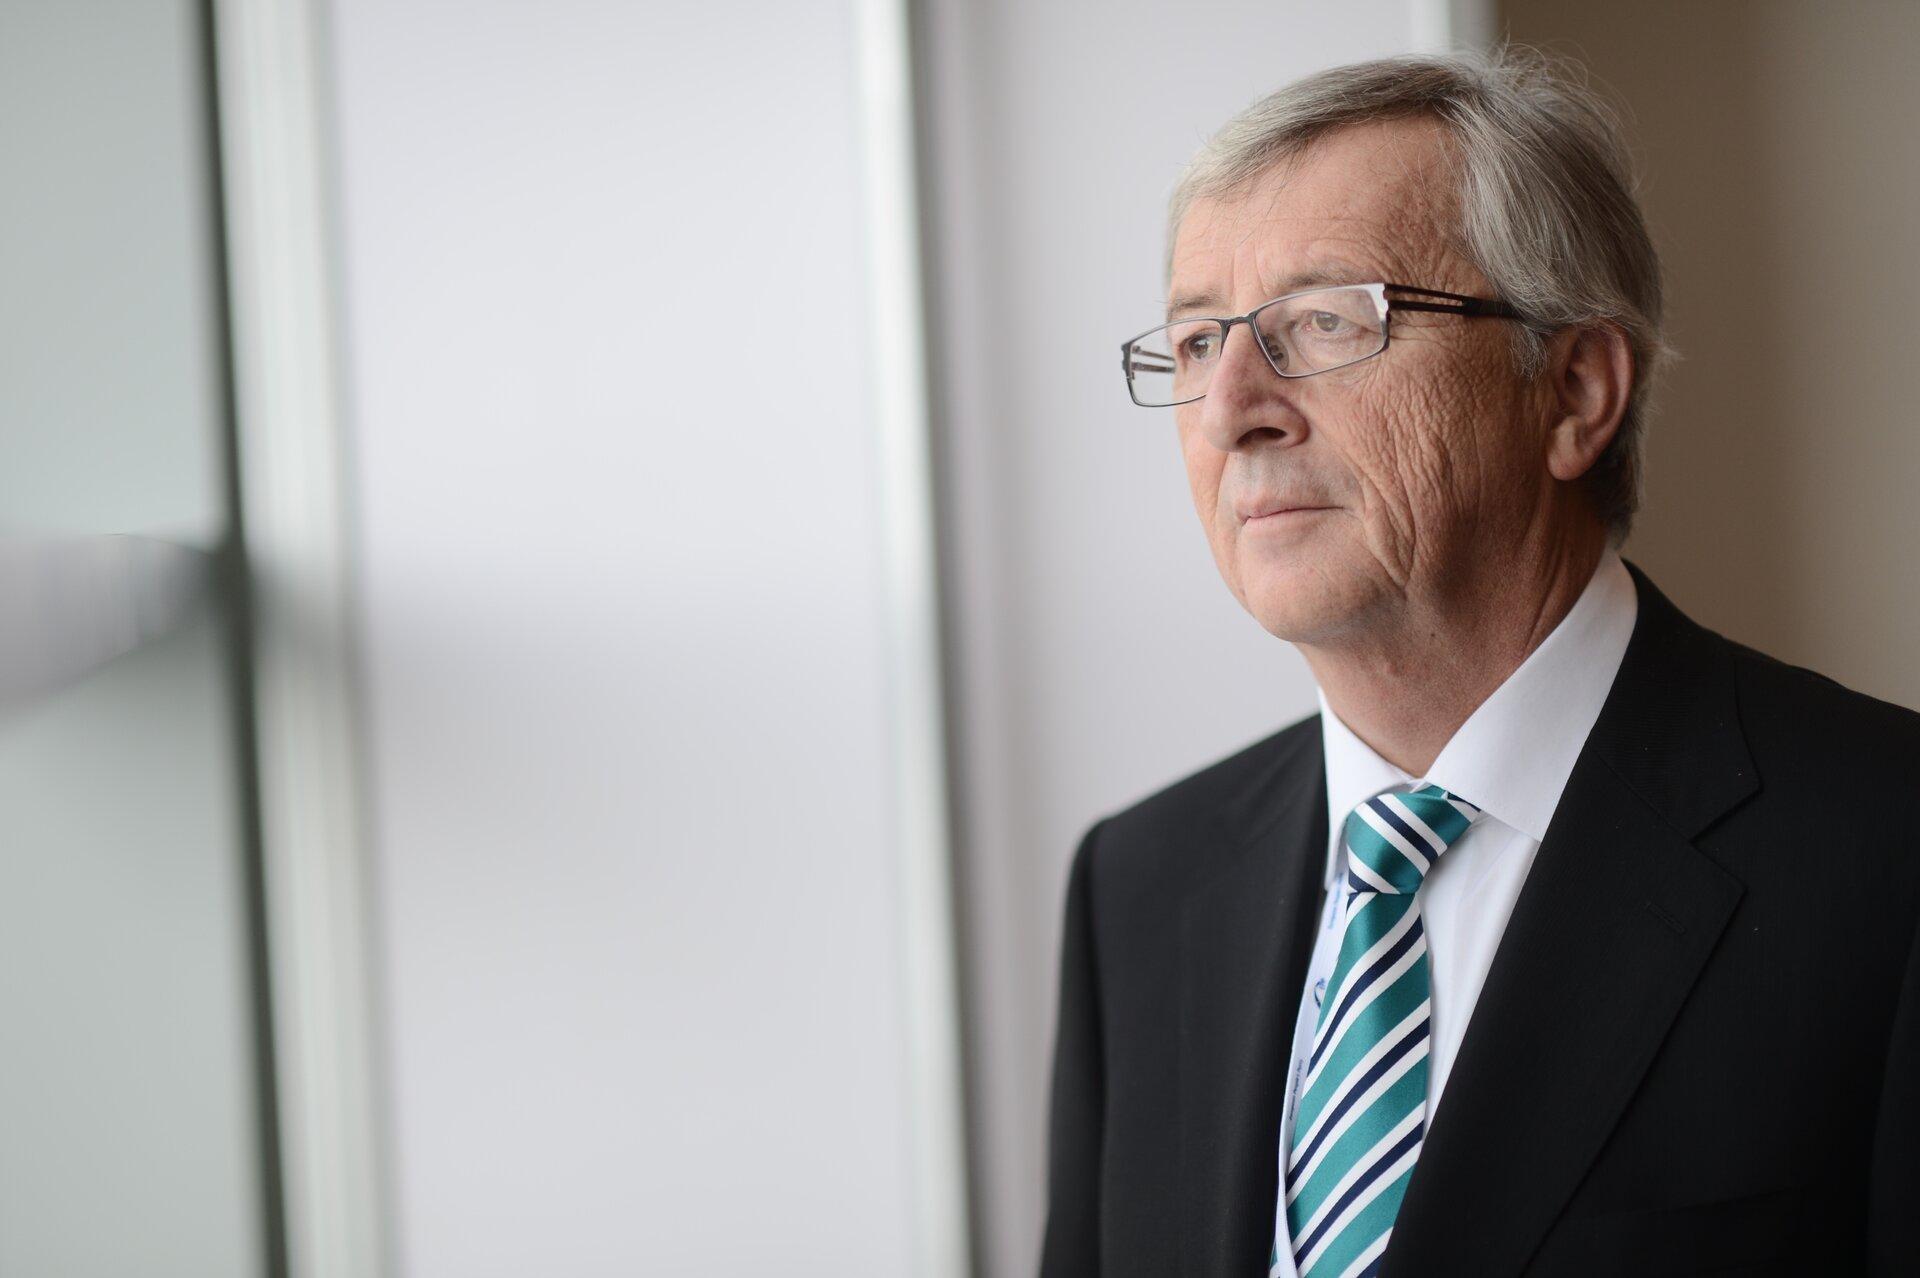 Jean-Claude Juncker (22 listopada 2004 - 1 listopada 2014)